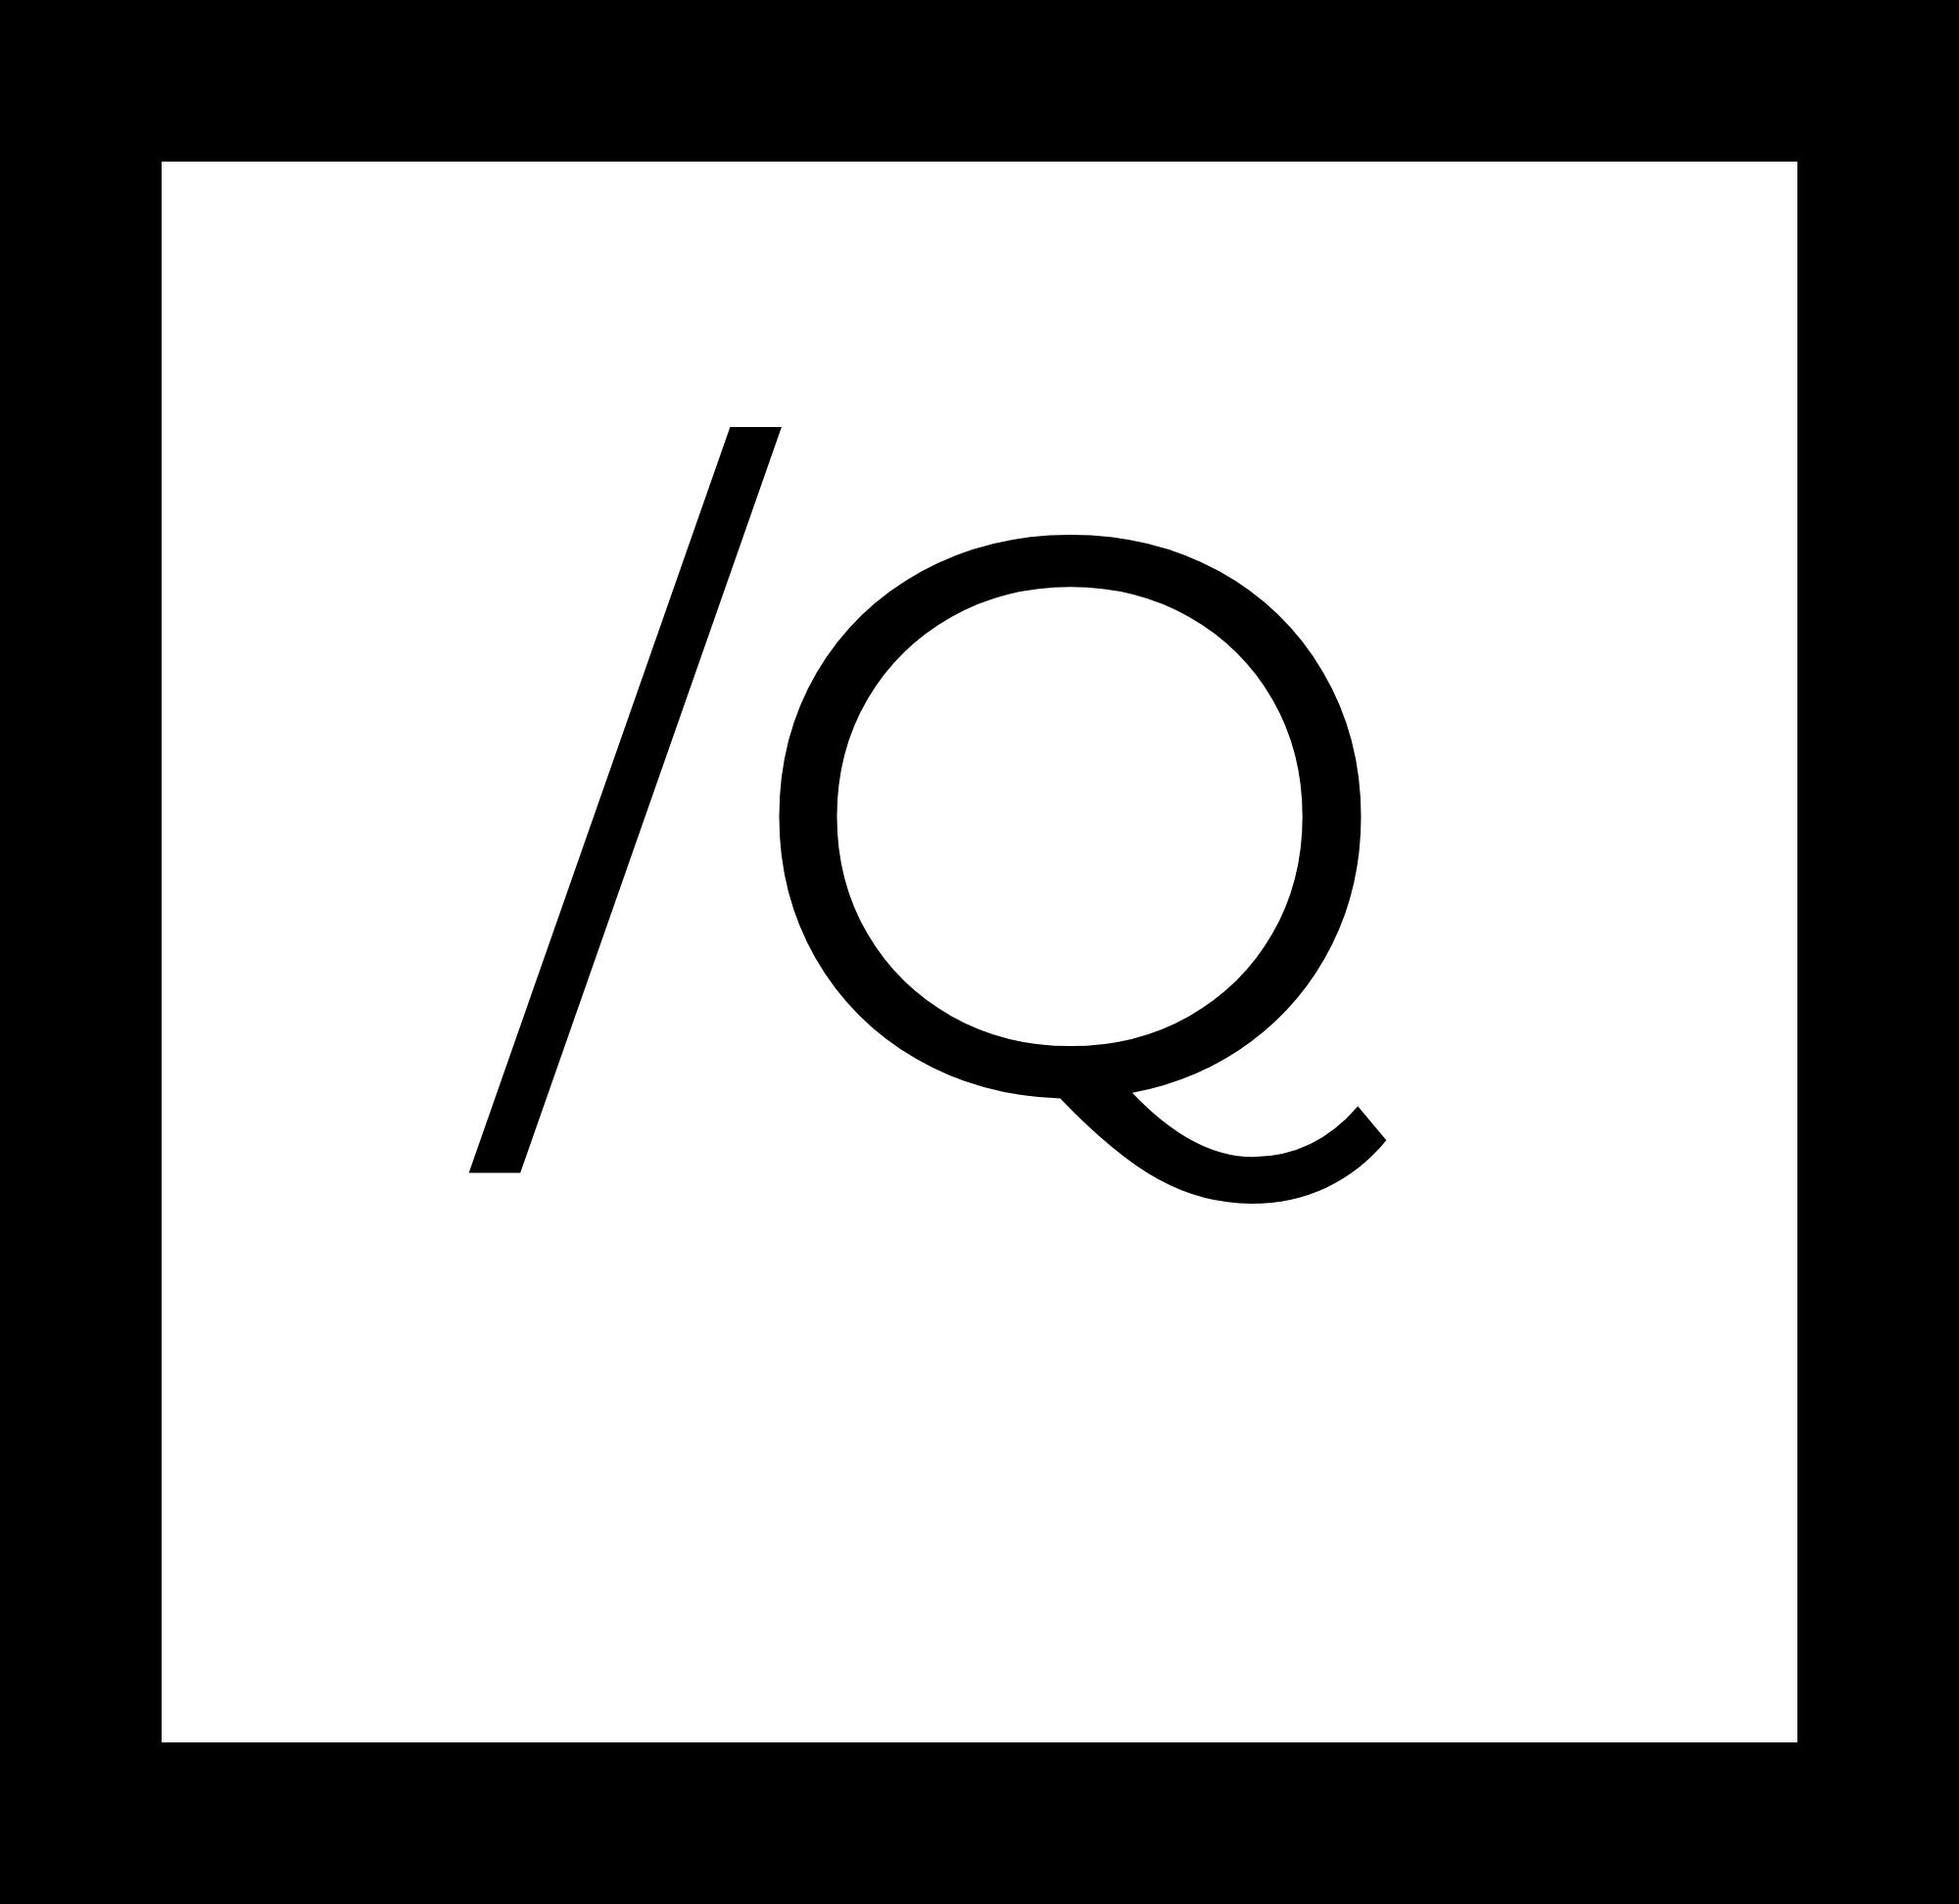 _Q-logo-white.png